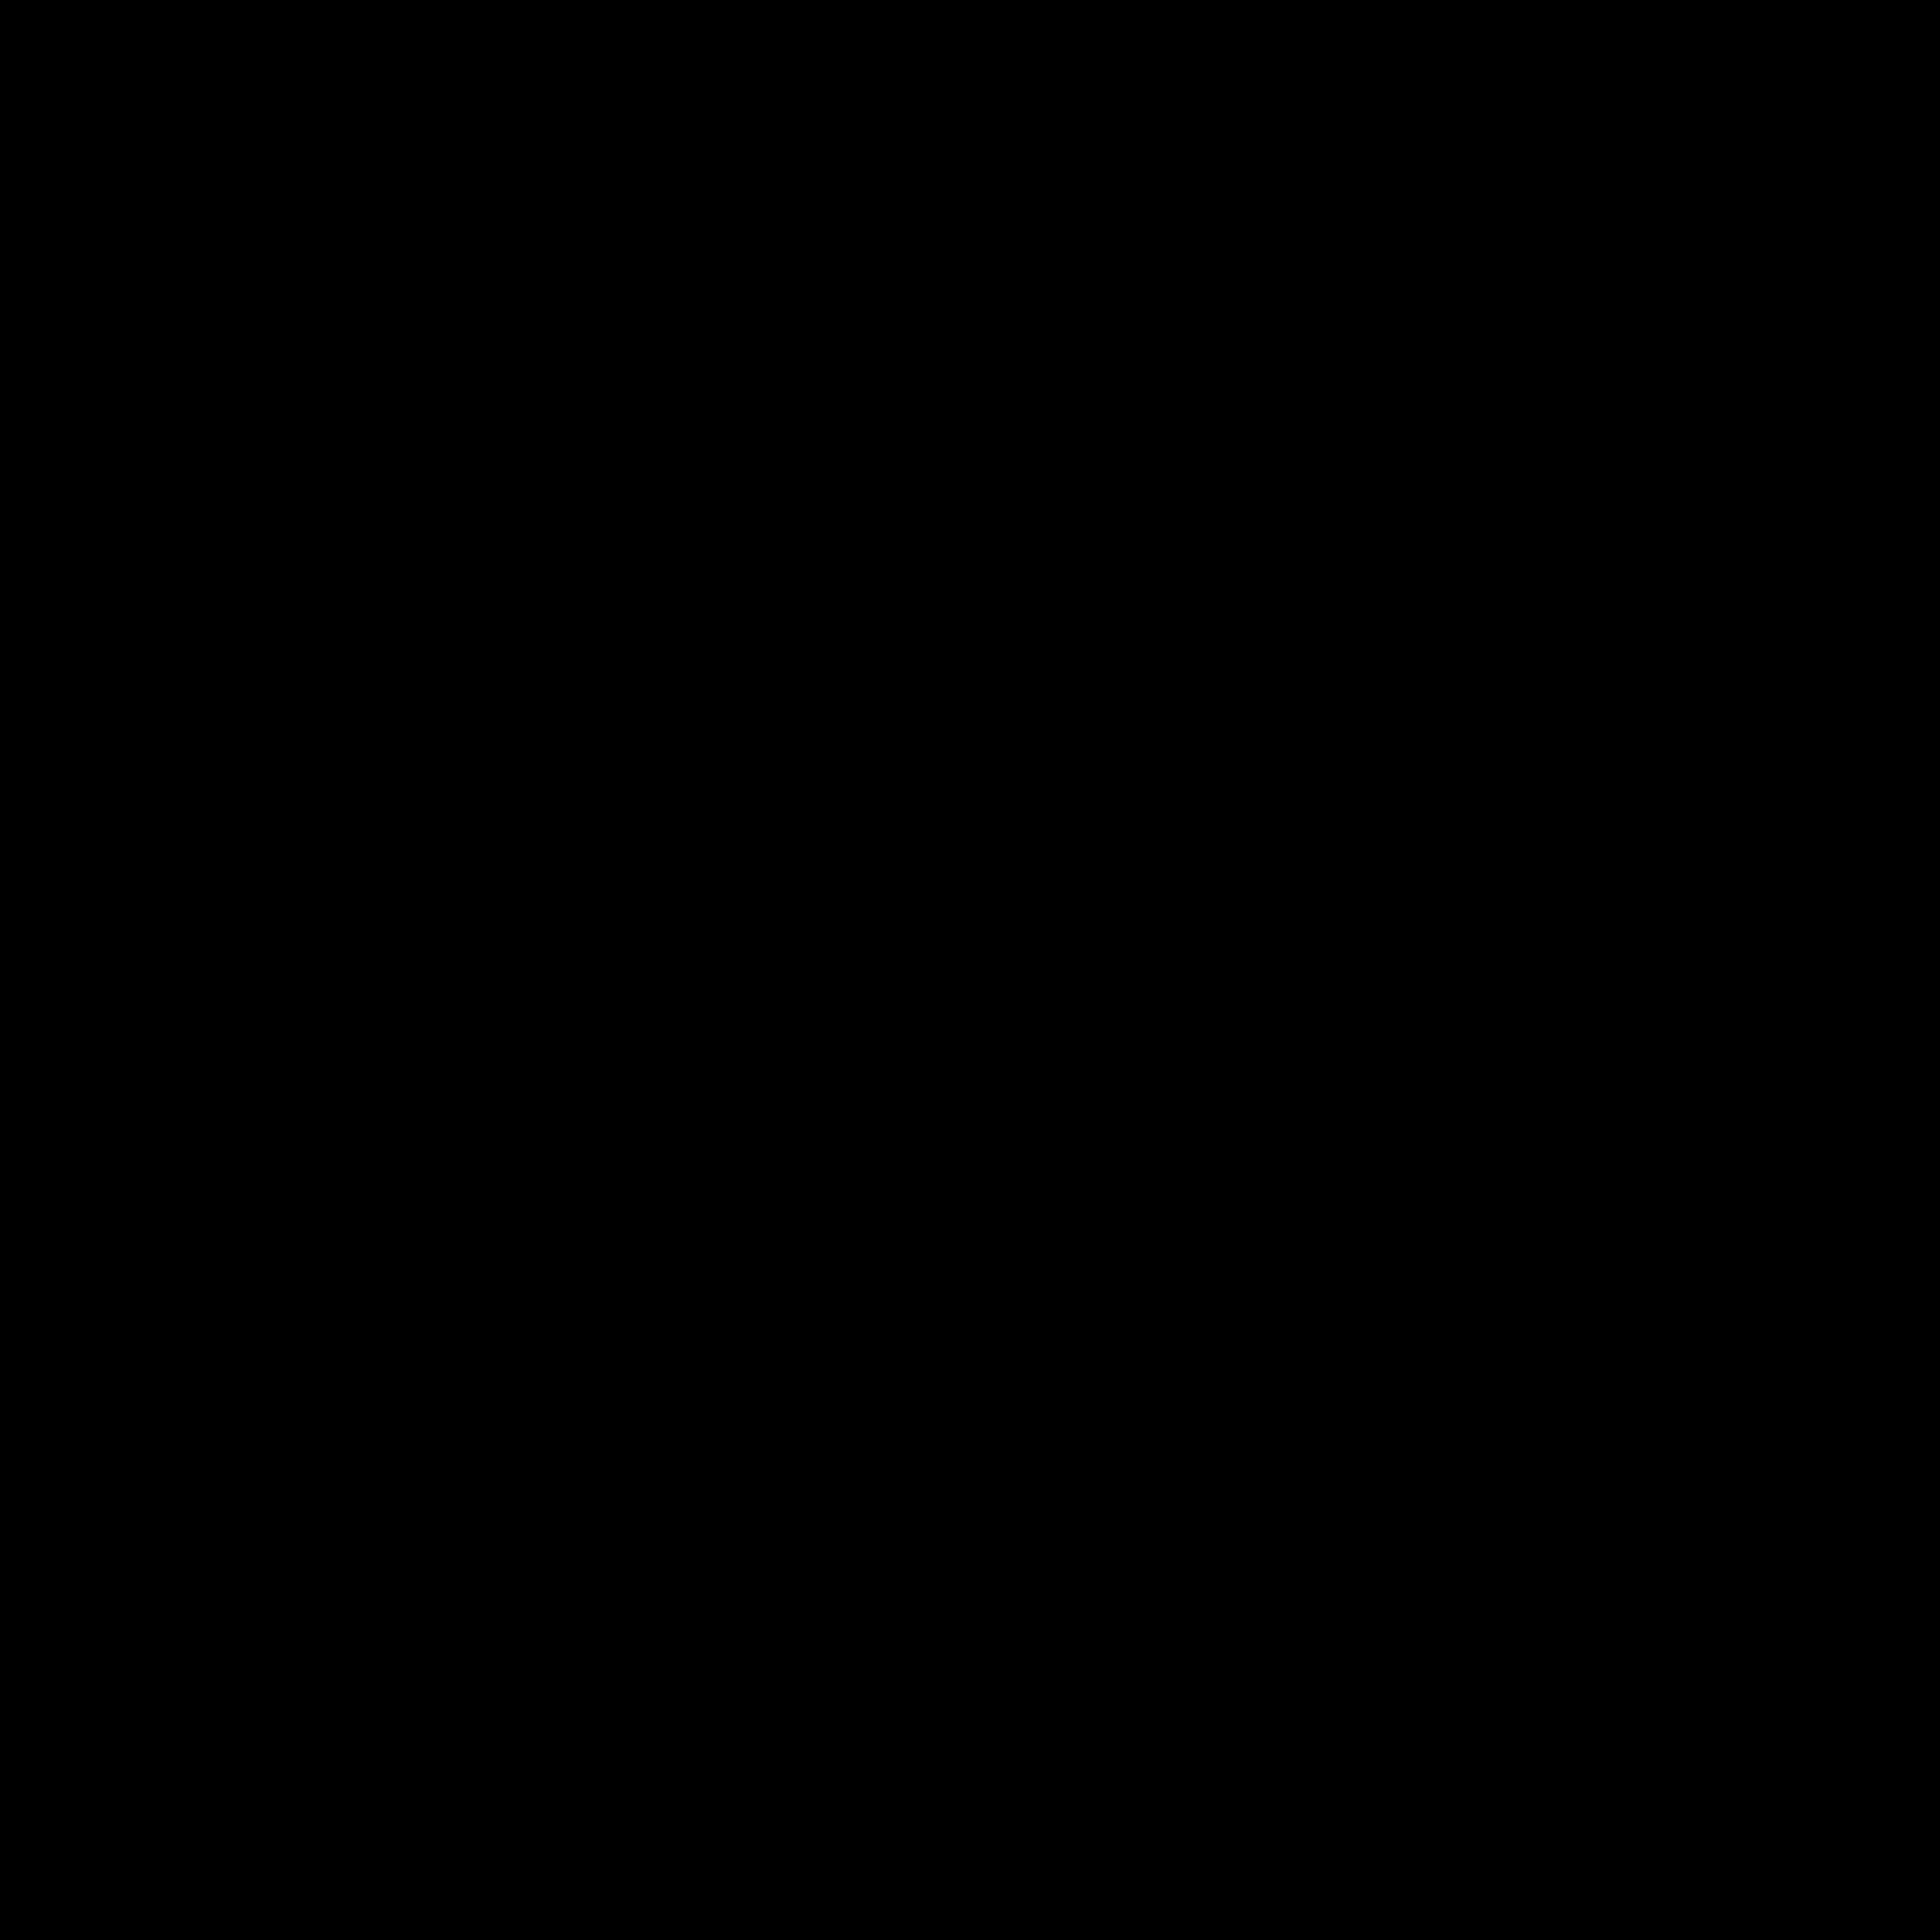 Clipart trumpet image 2.